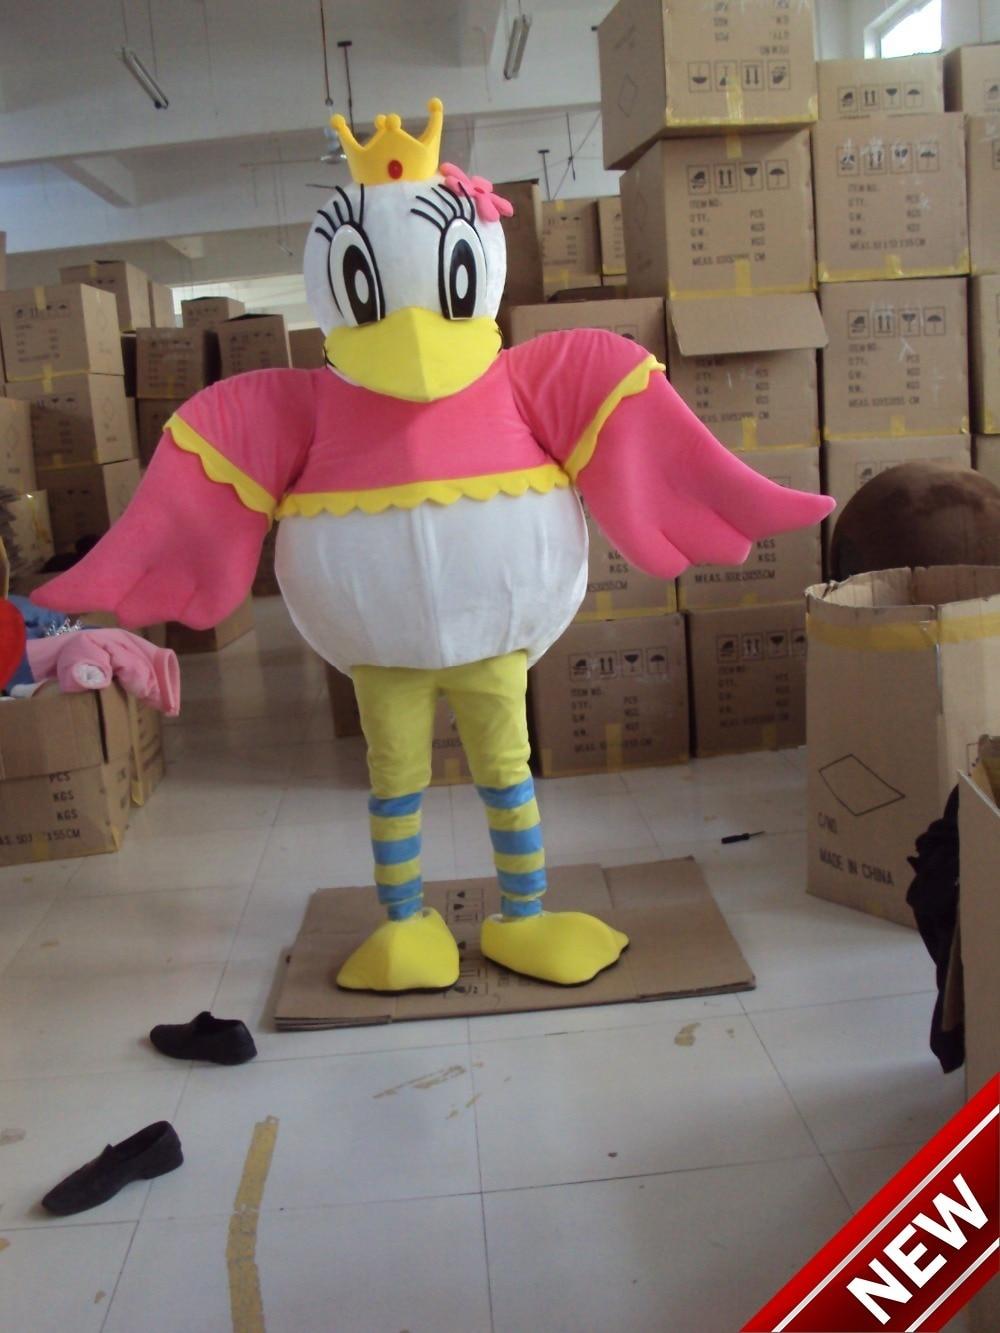 Costume de mascotte Adulte Costume de Personnage de mascotte Comme mode freeshipping cosplay canard reine